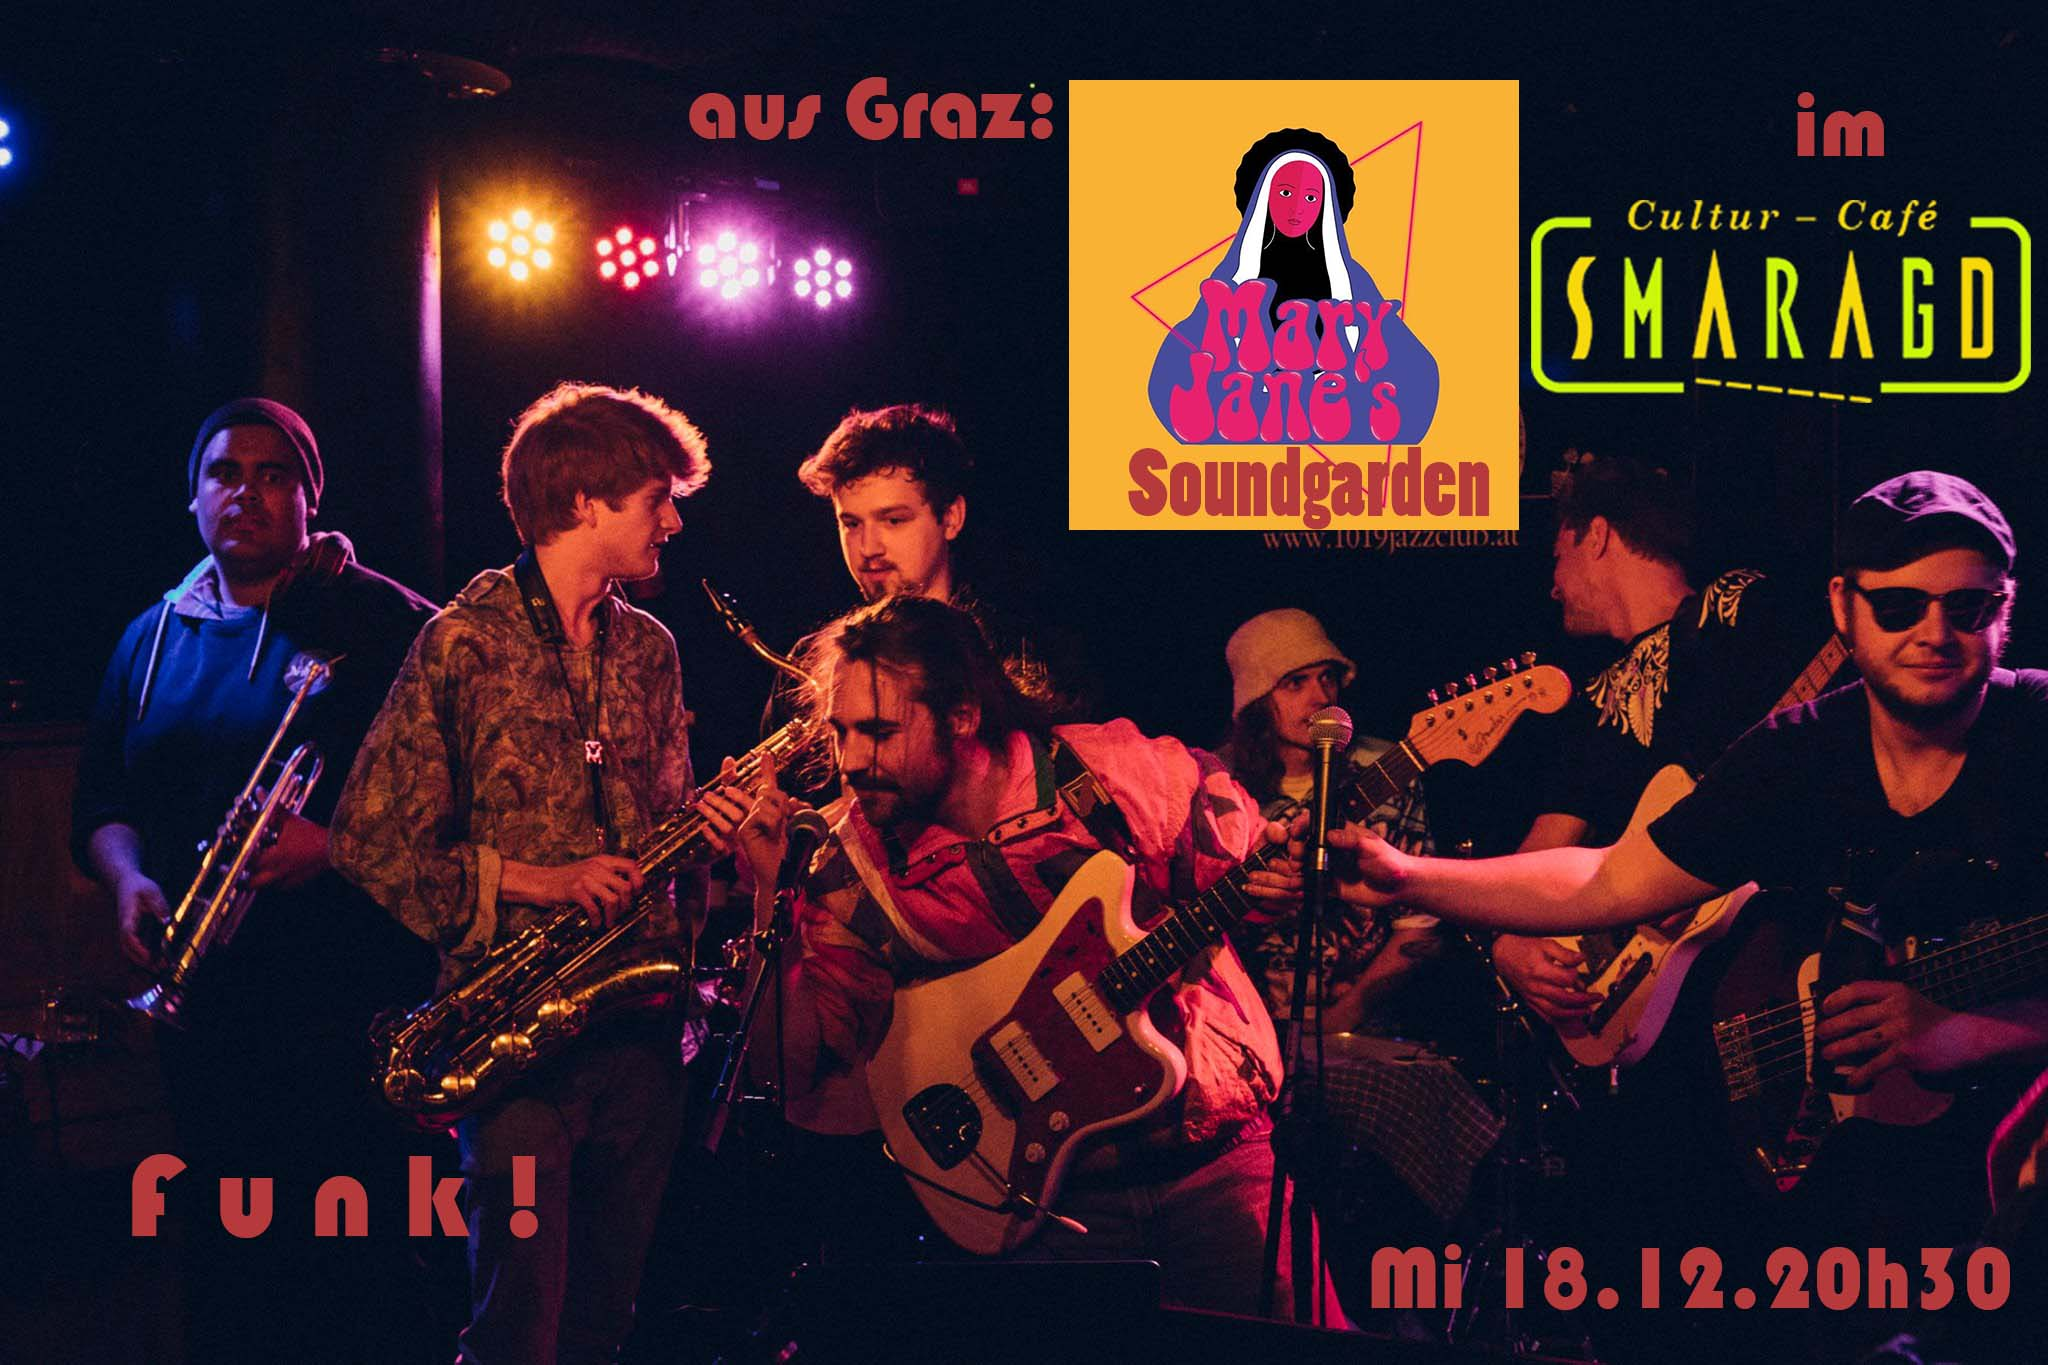 ccsmaragd-linz-maryjanessoundgarden3